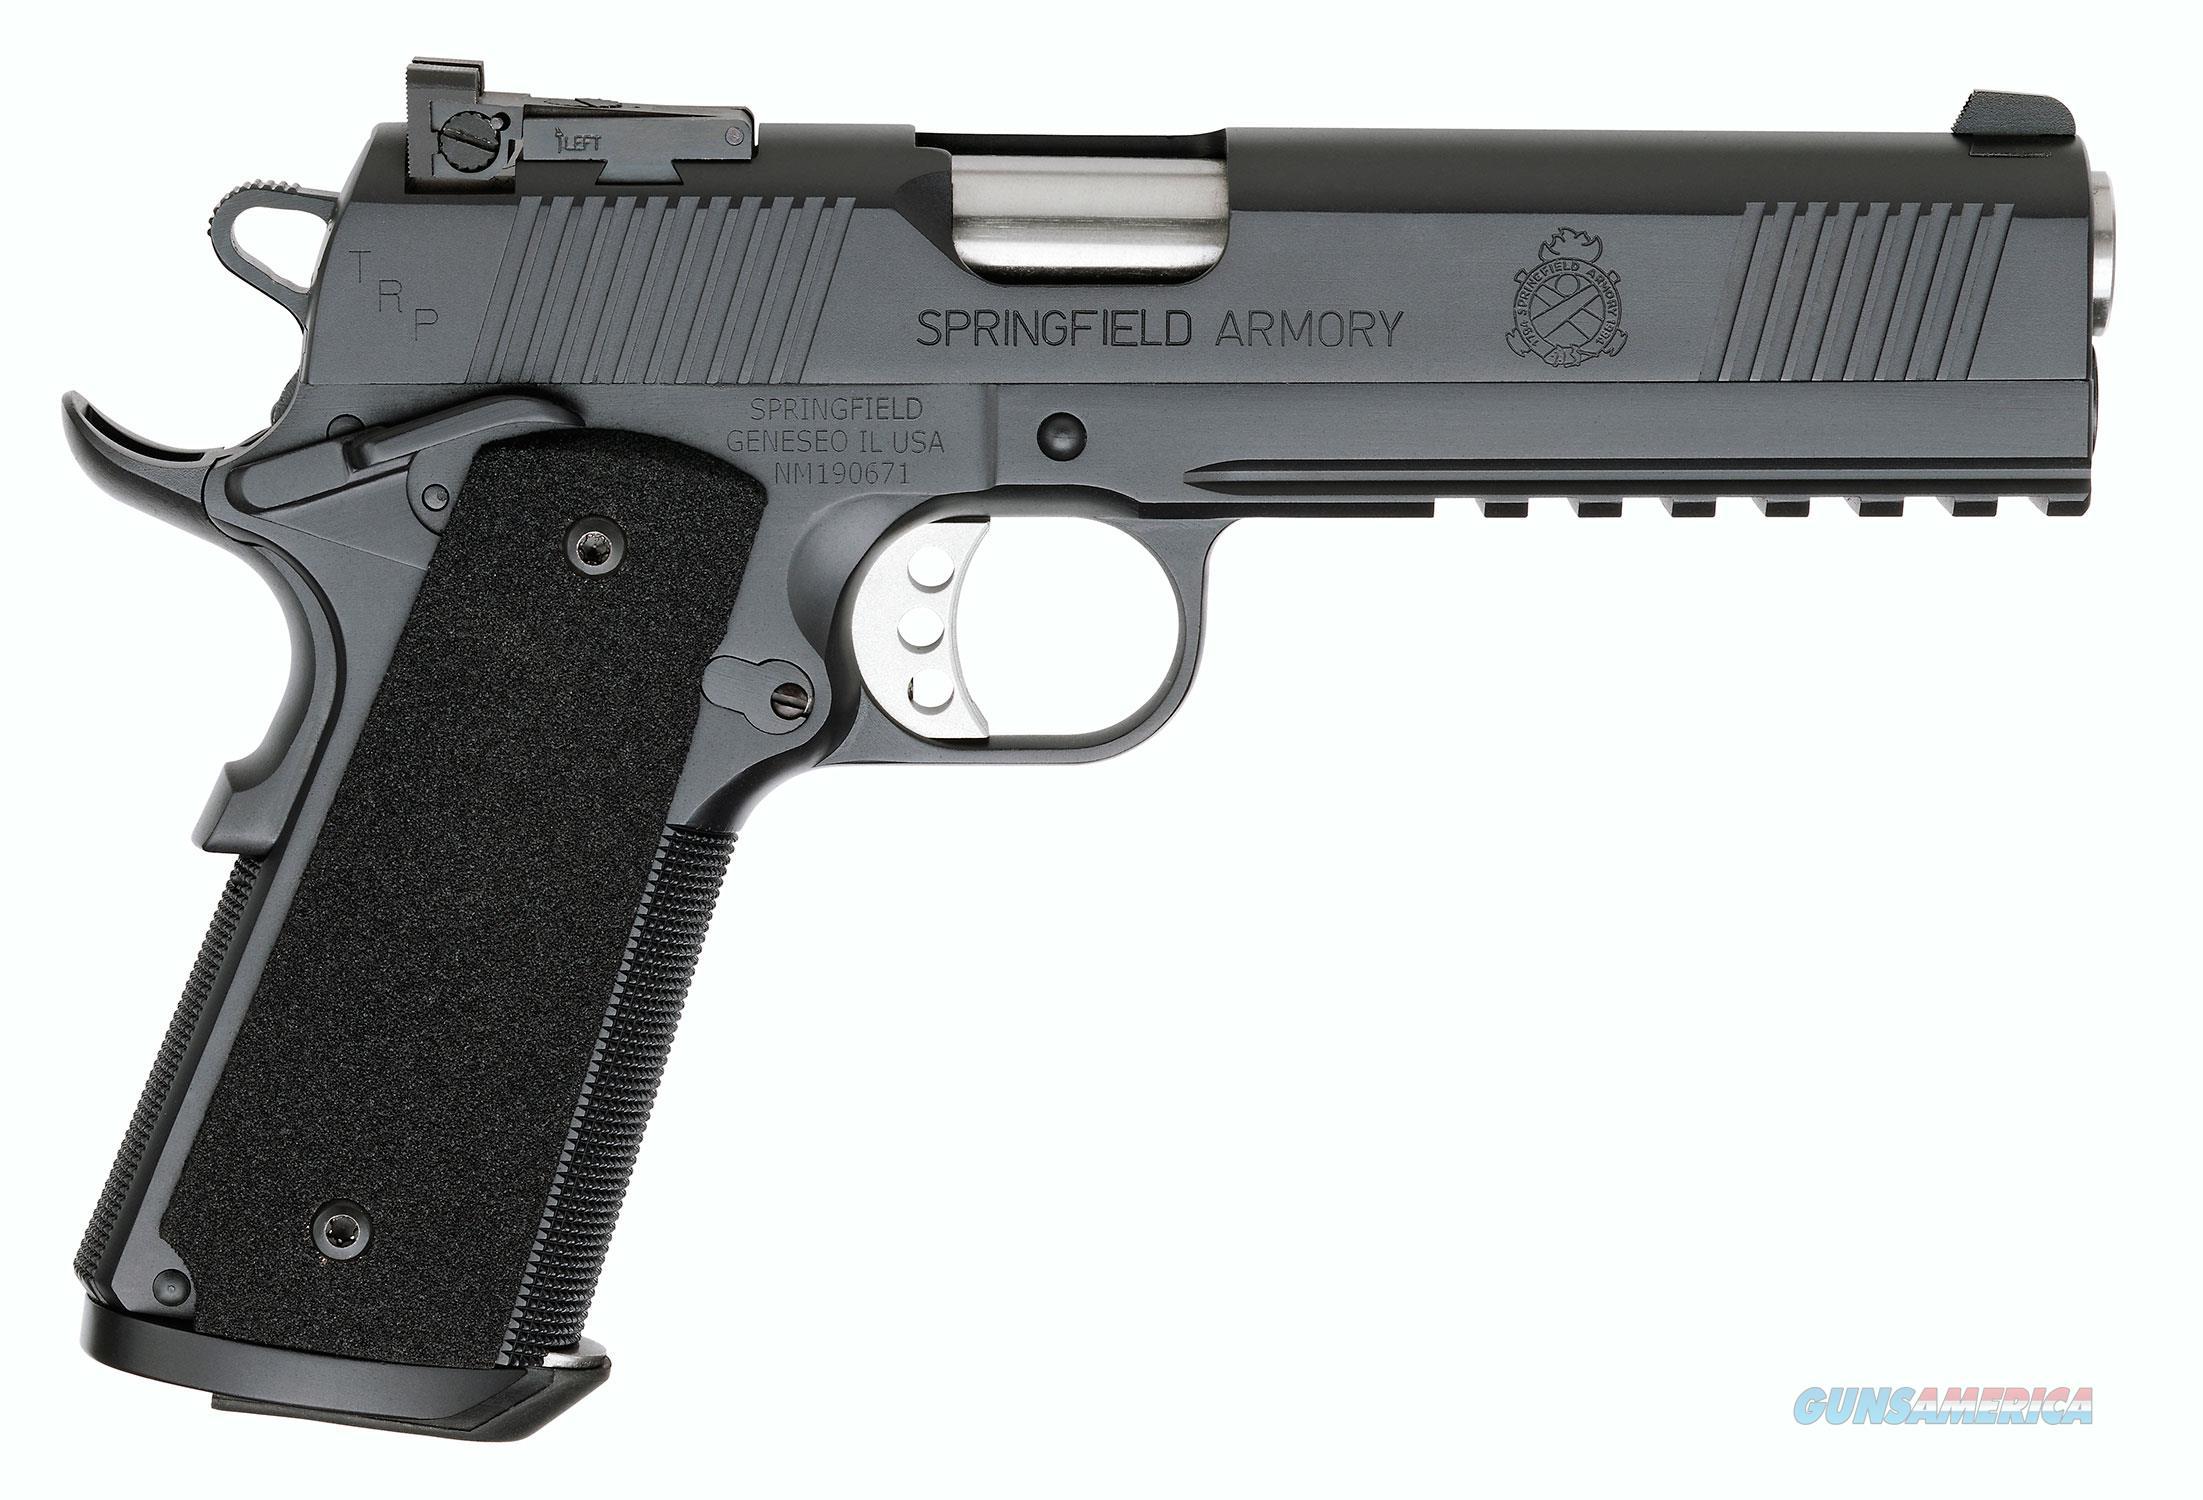 Springfield TRP Operator 45 acp RAIL NS *NEW* PC9105LCA18   Guns > Pistols > Springfield Armory Pistols > 1911 Type